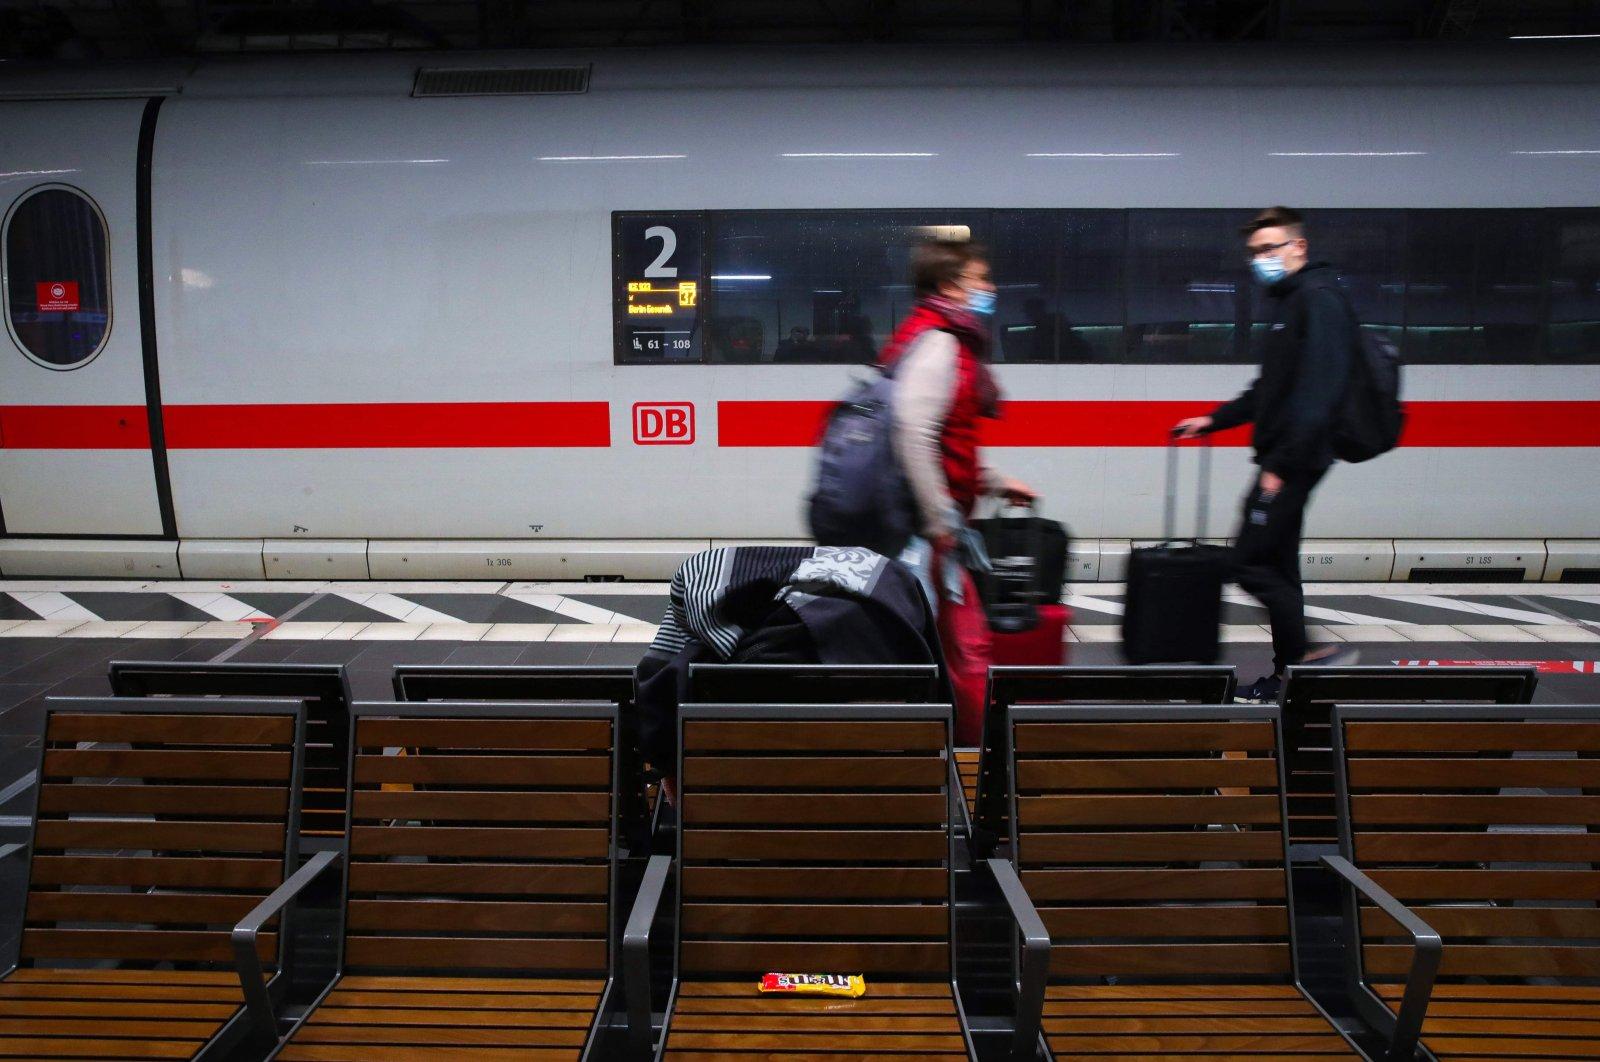 Passengers walk along a platform at the main railway station in Frankfurt am Main, western Germany, Aug. 23, 2021. (AFP Photo)